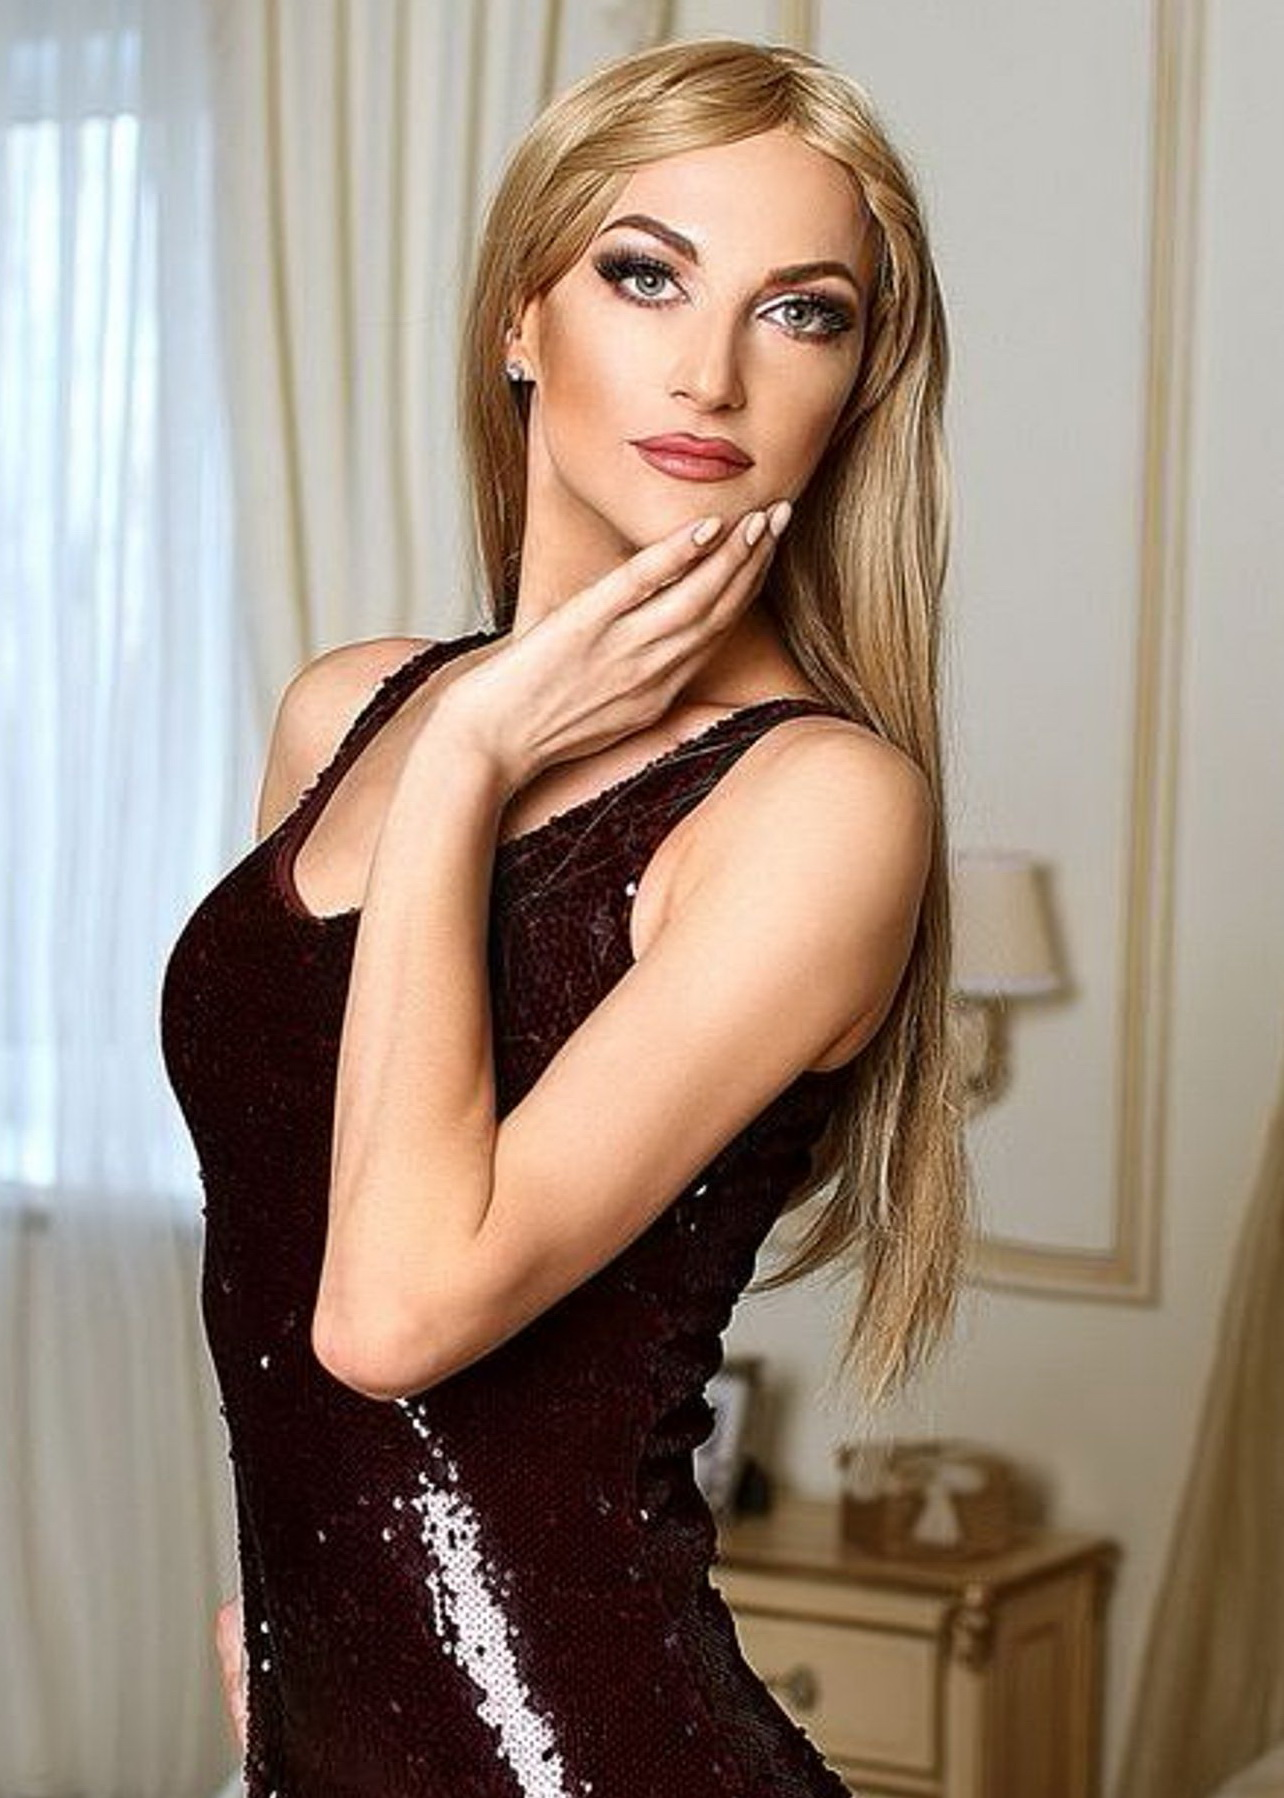 russian wife american husband